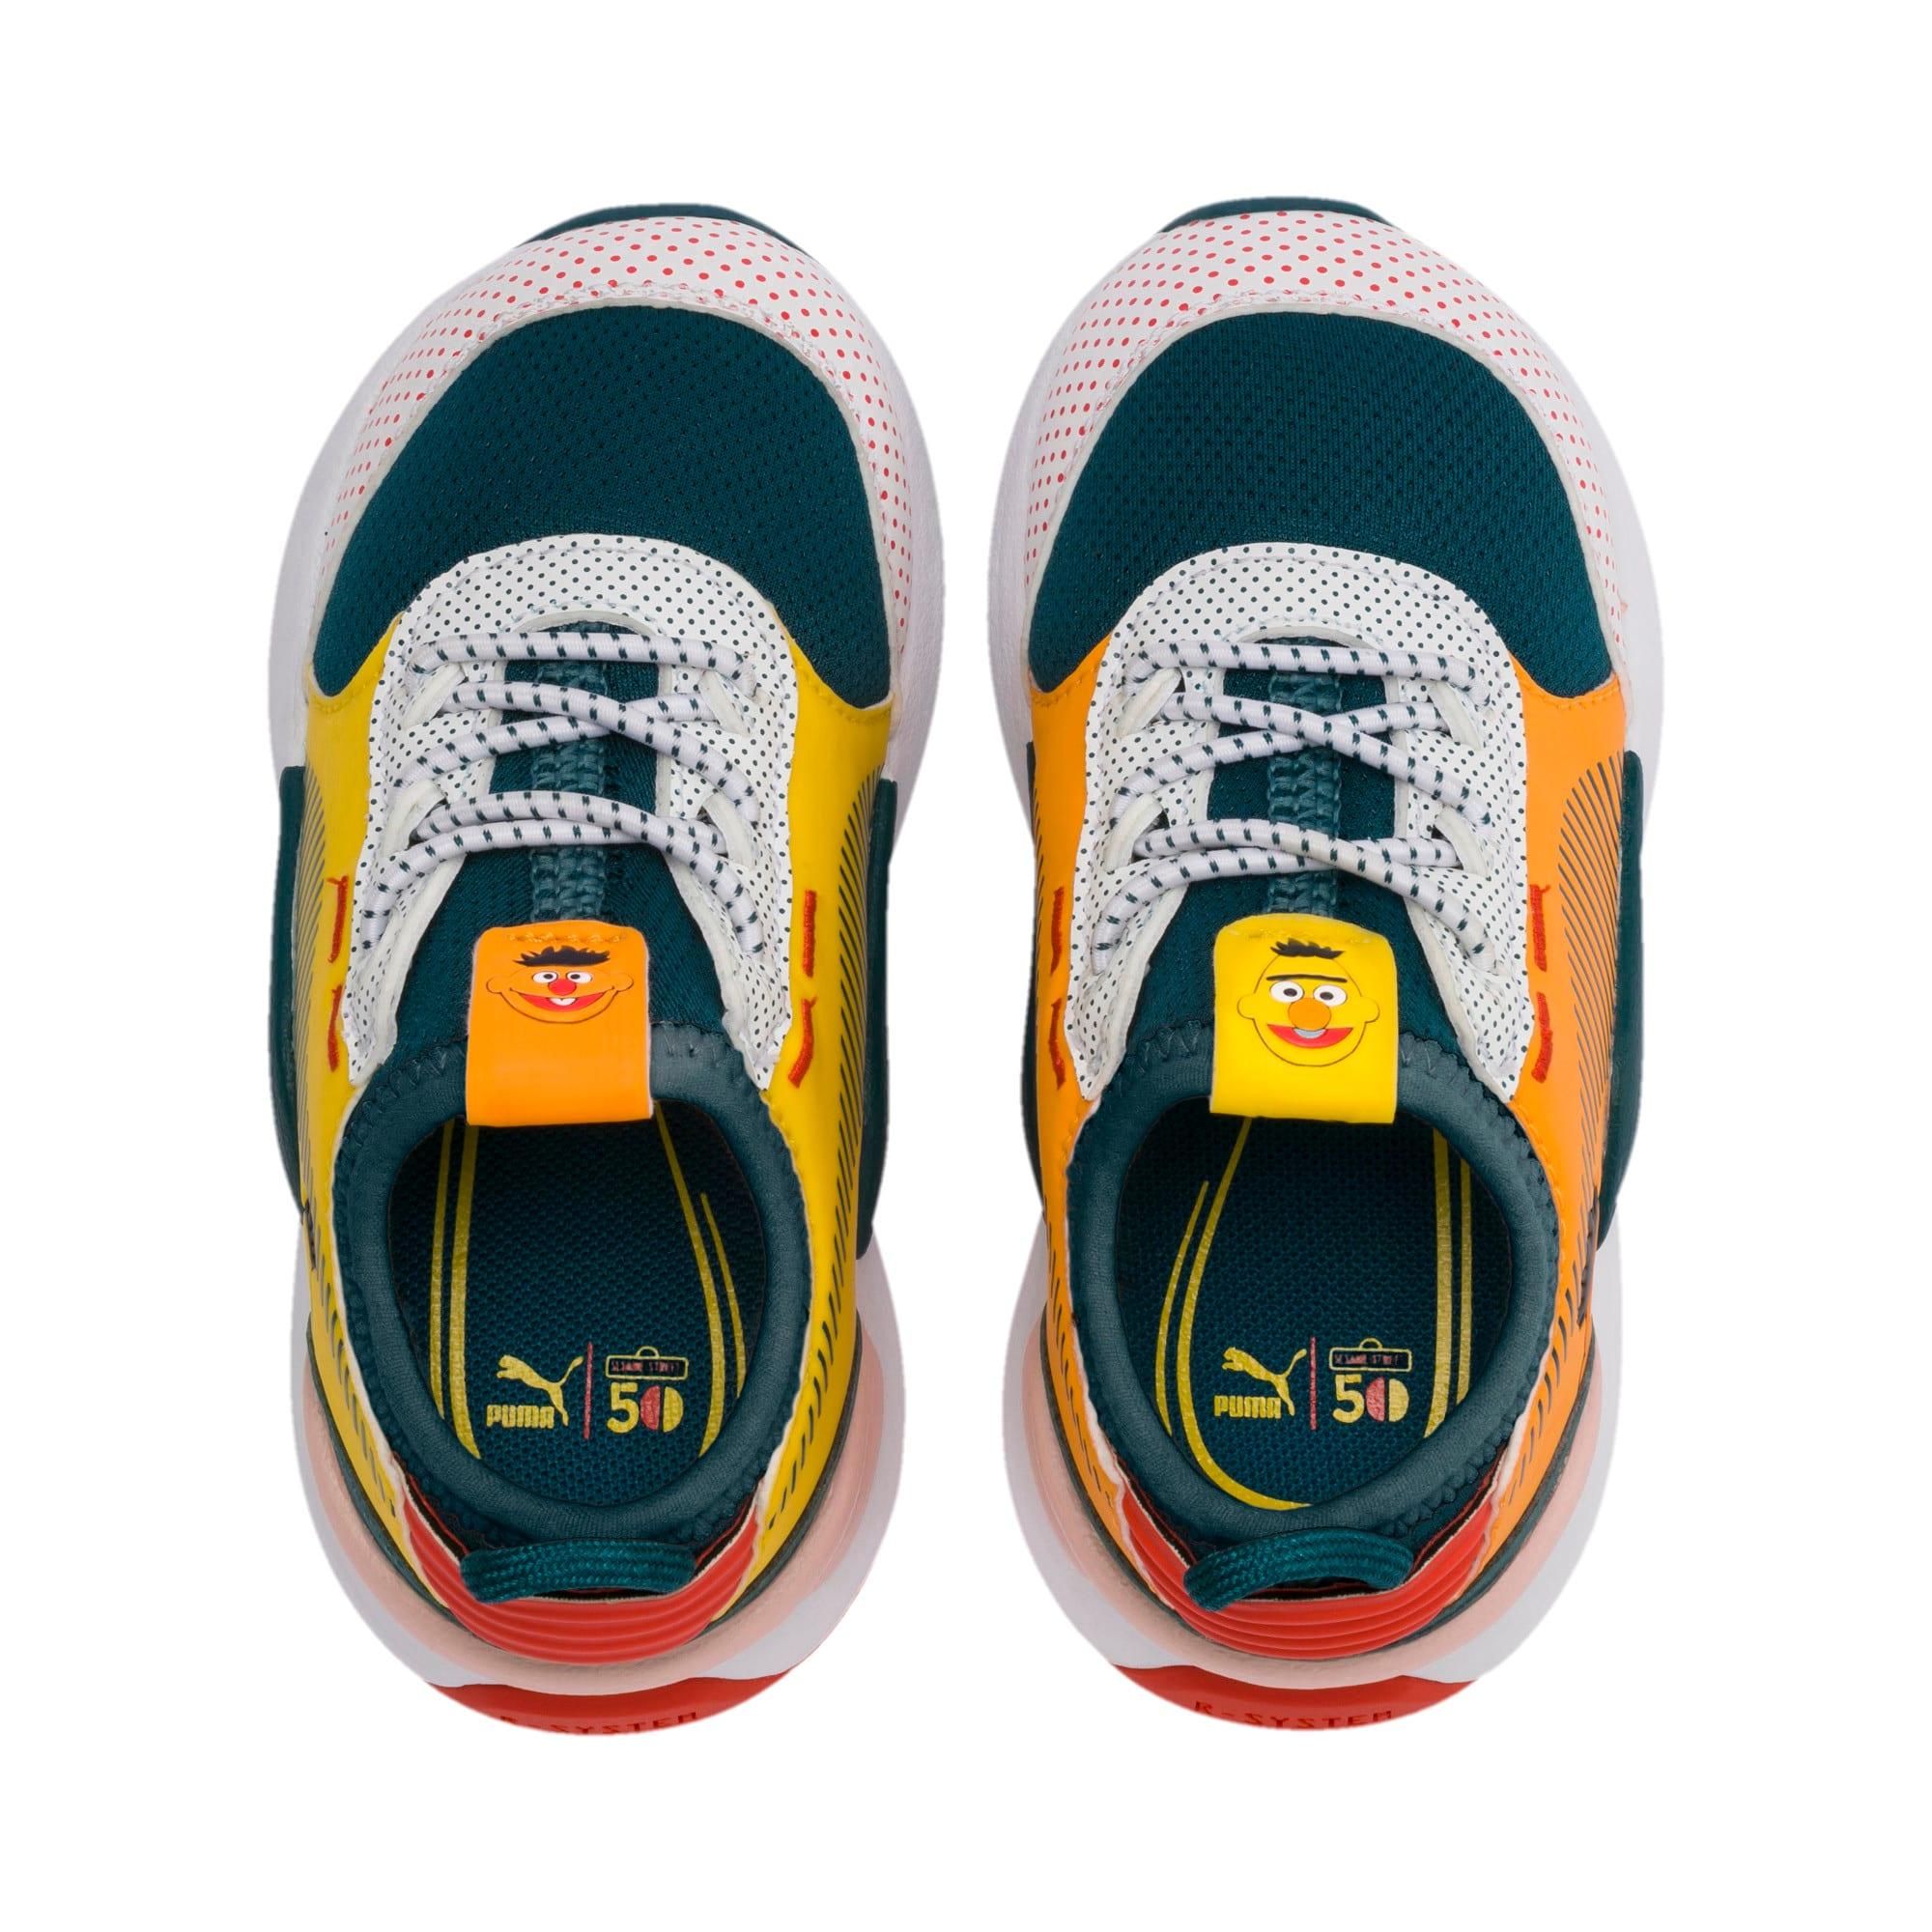 Thumbnail 6 of Sesame Street 50 RS-0 AC Toddler Shoes, Rose-BlueCoral-Dandelion, medium